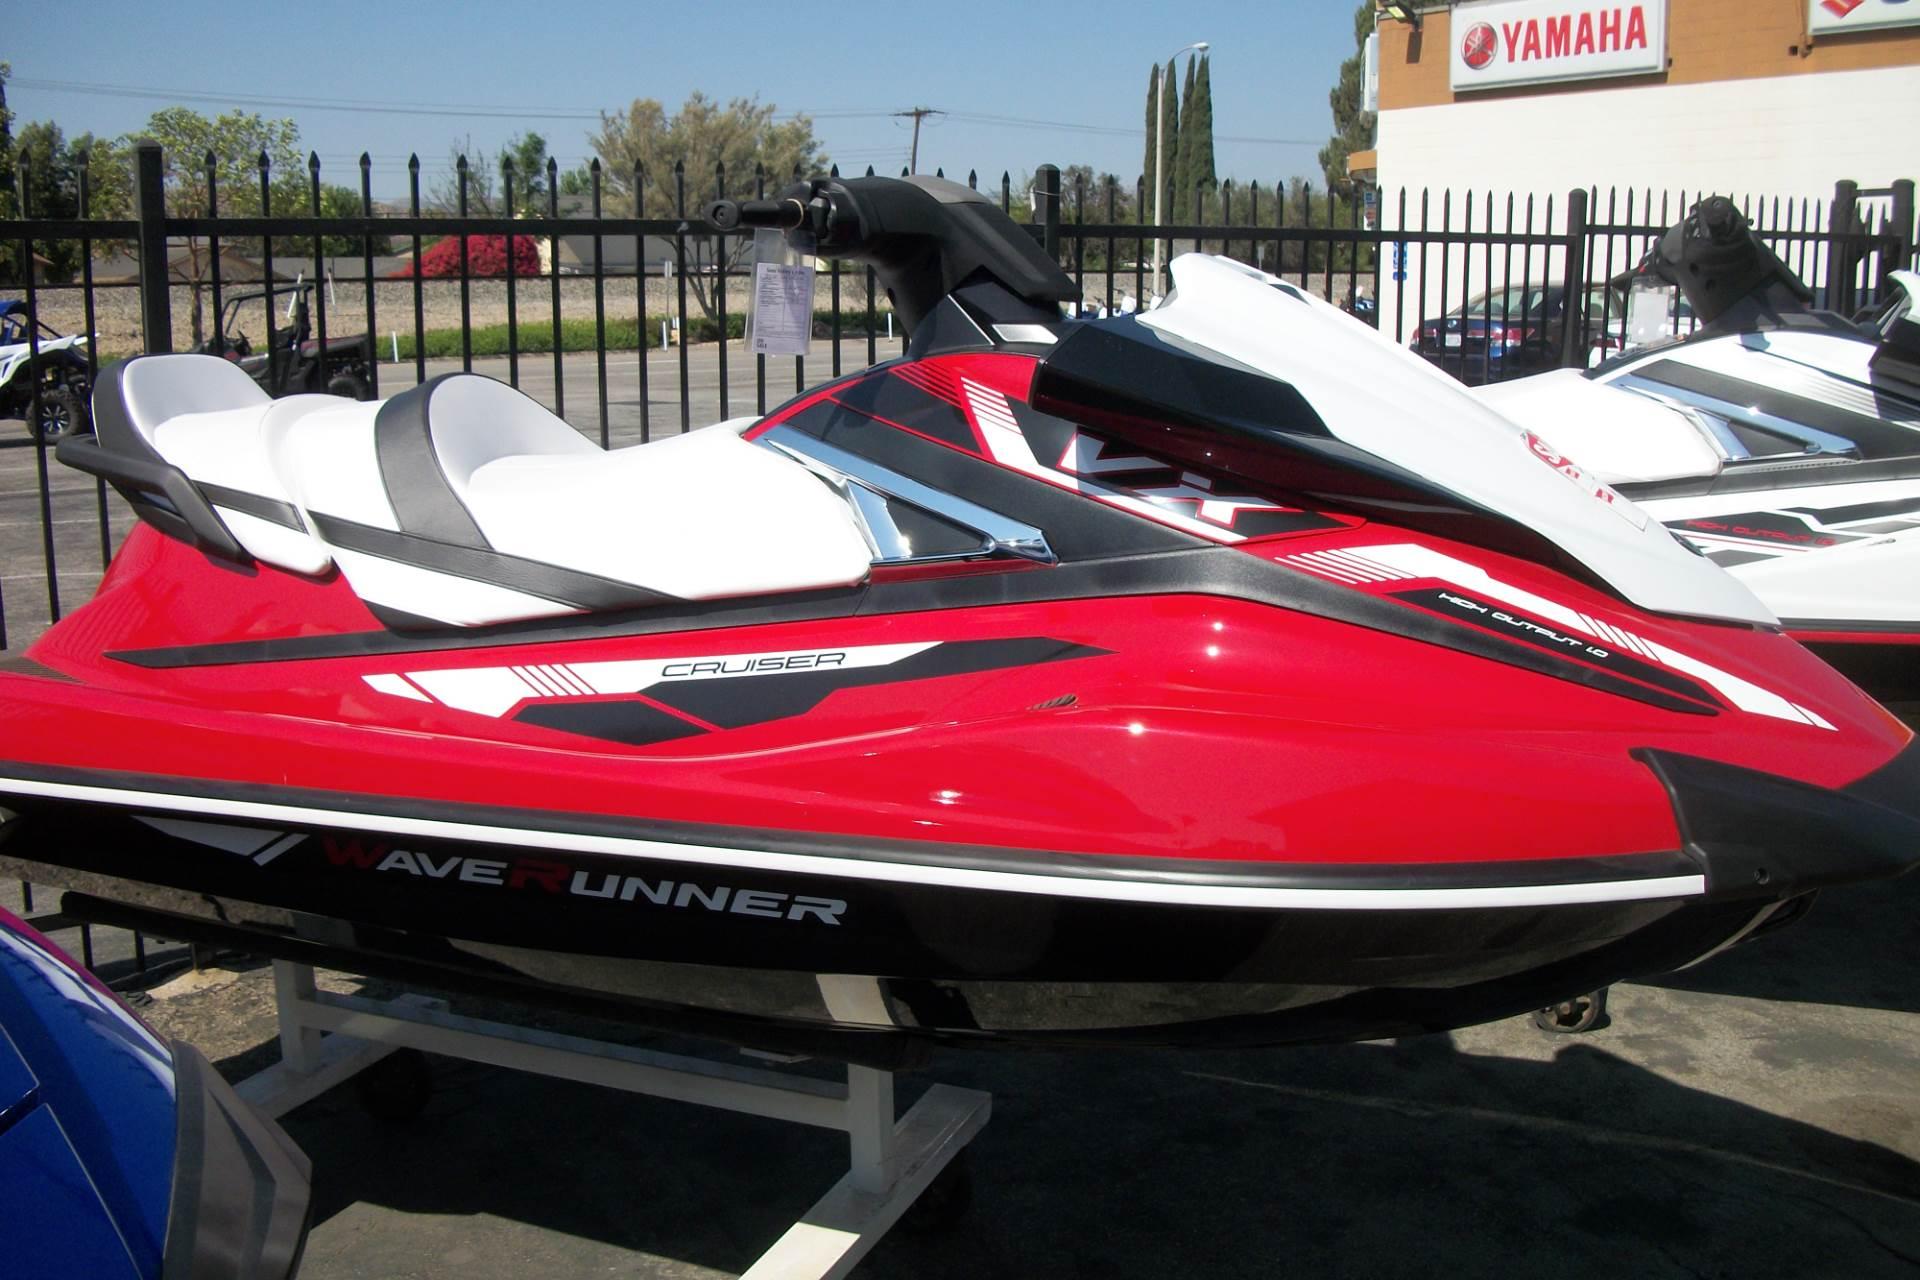 New 2018 Yamaha VX Cruiser Watercraft in Simi Valley CA